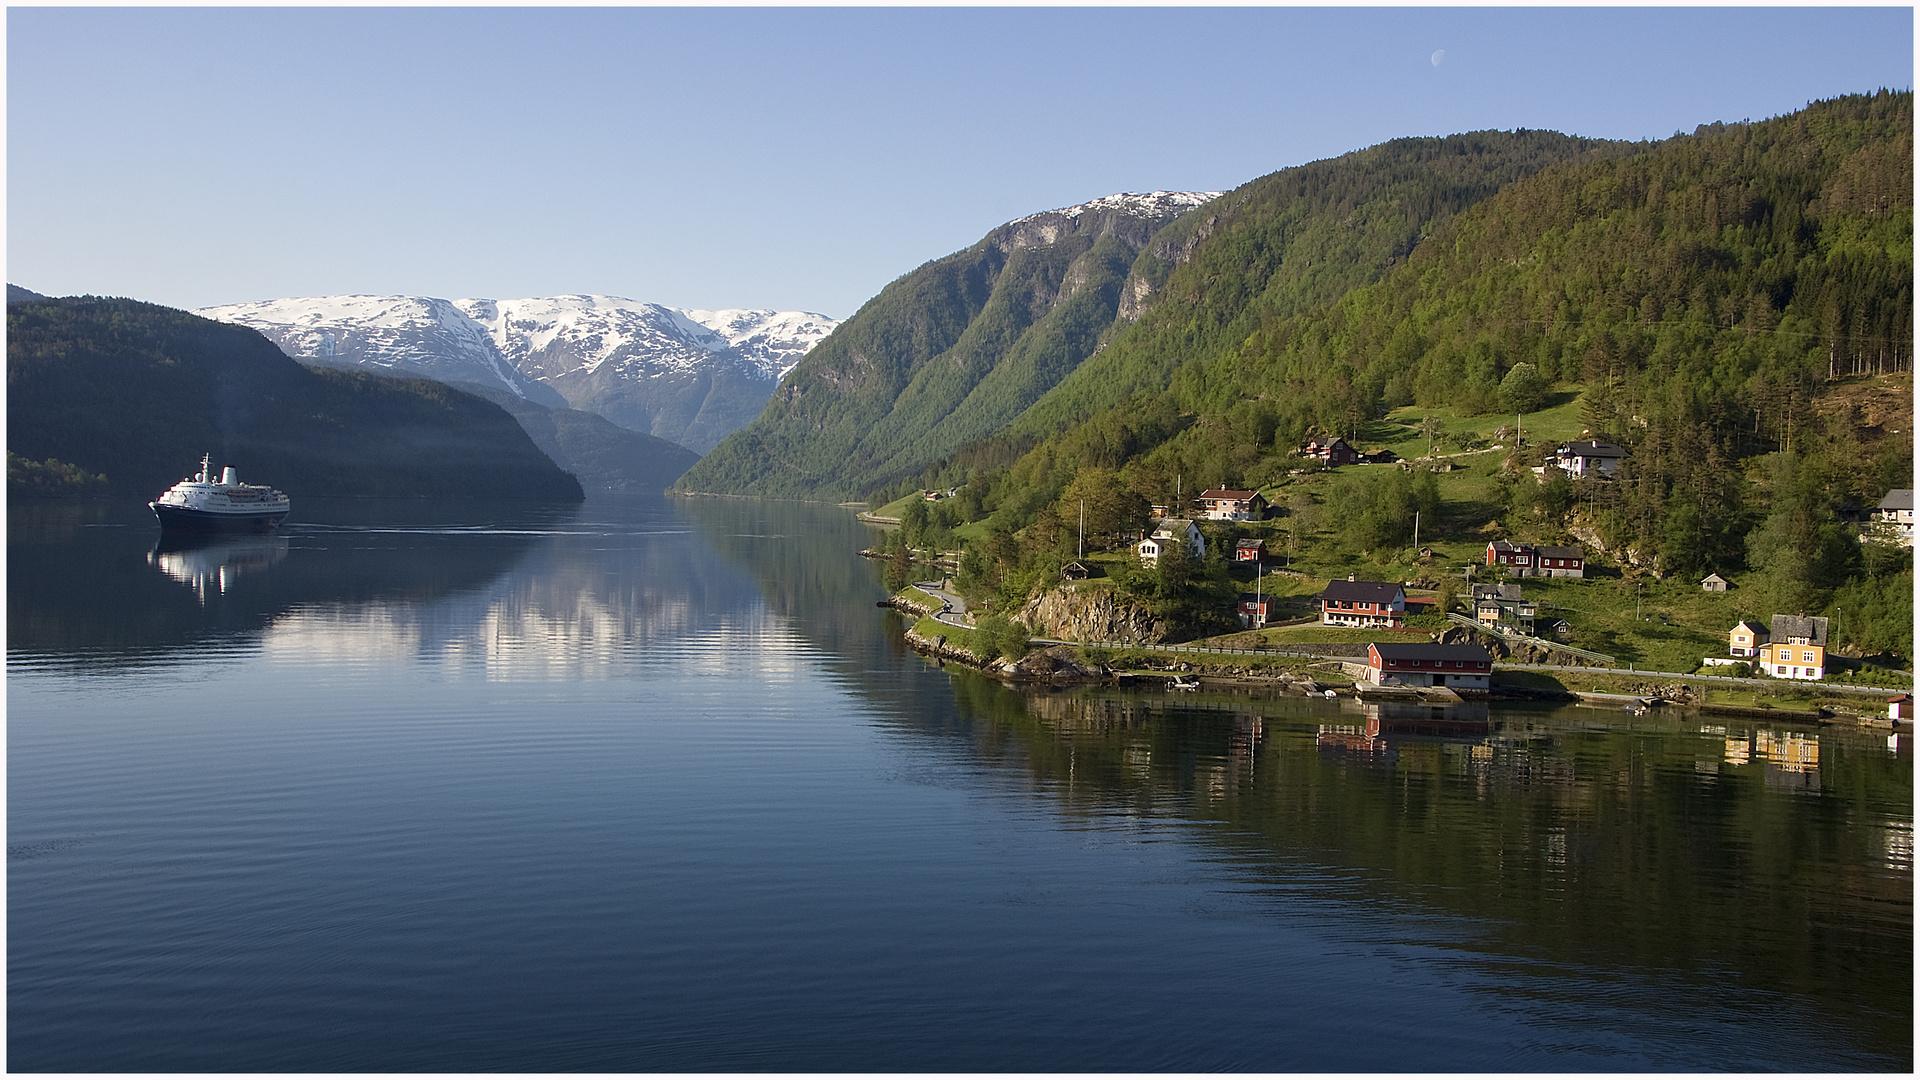 Hardanger Fjord bei Ulvik